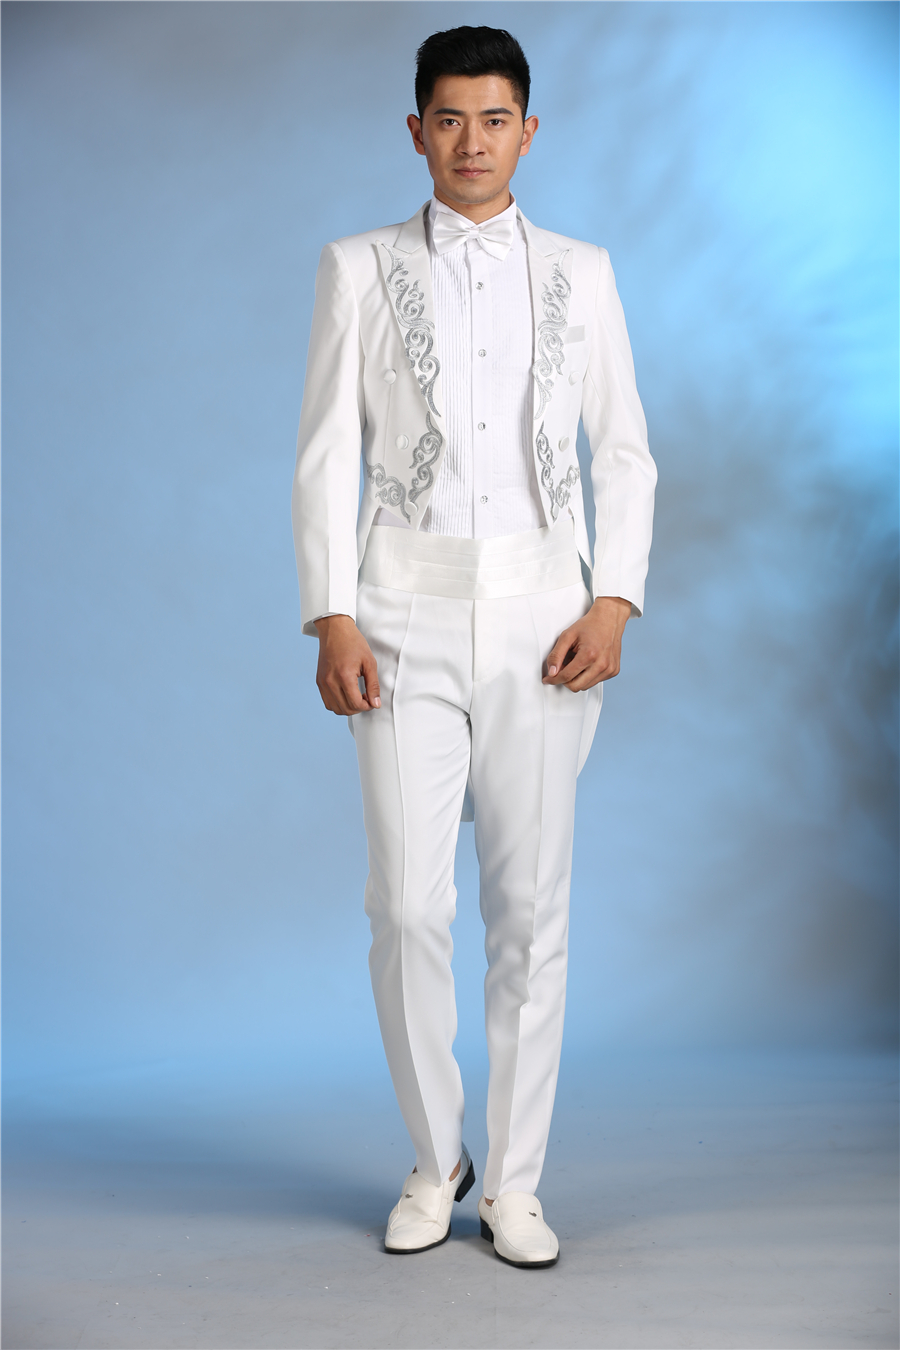 Fantastic Men Wedding Suit Hire Vignette - Wedding Dress - googeb.com